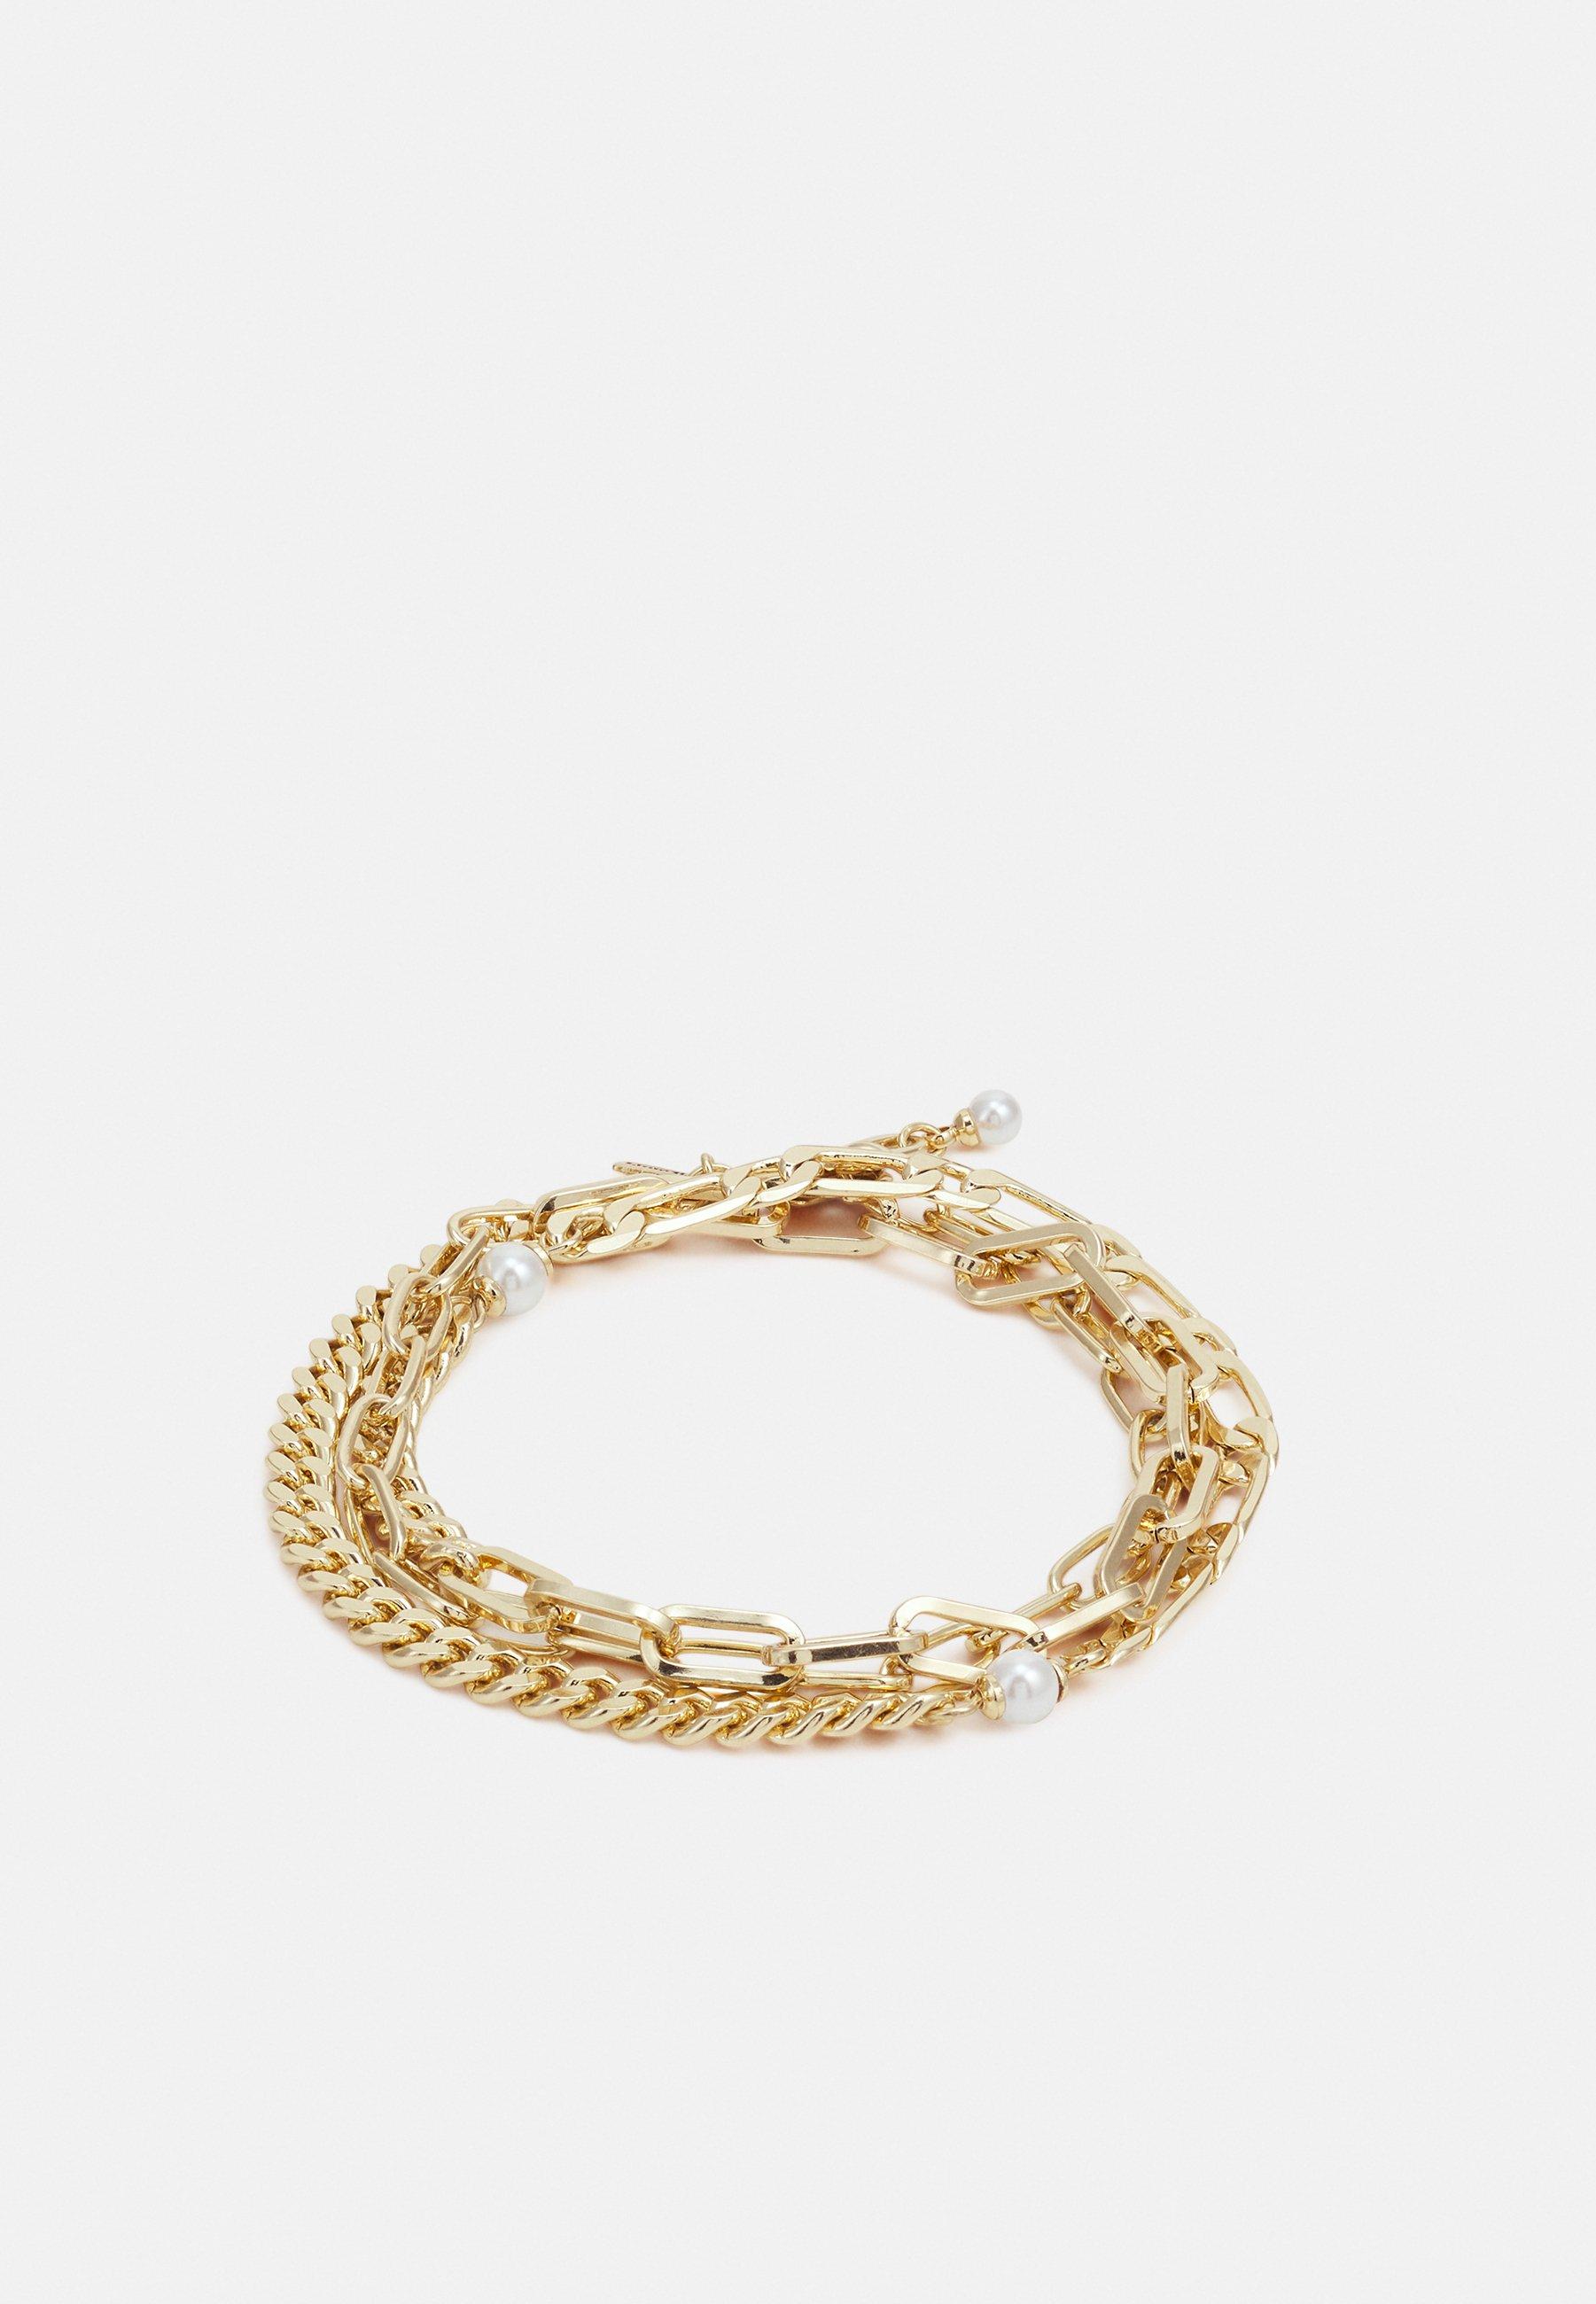 Femme BRACELET ENCHANTMENT 2 in 1 - Bracelet